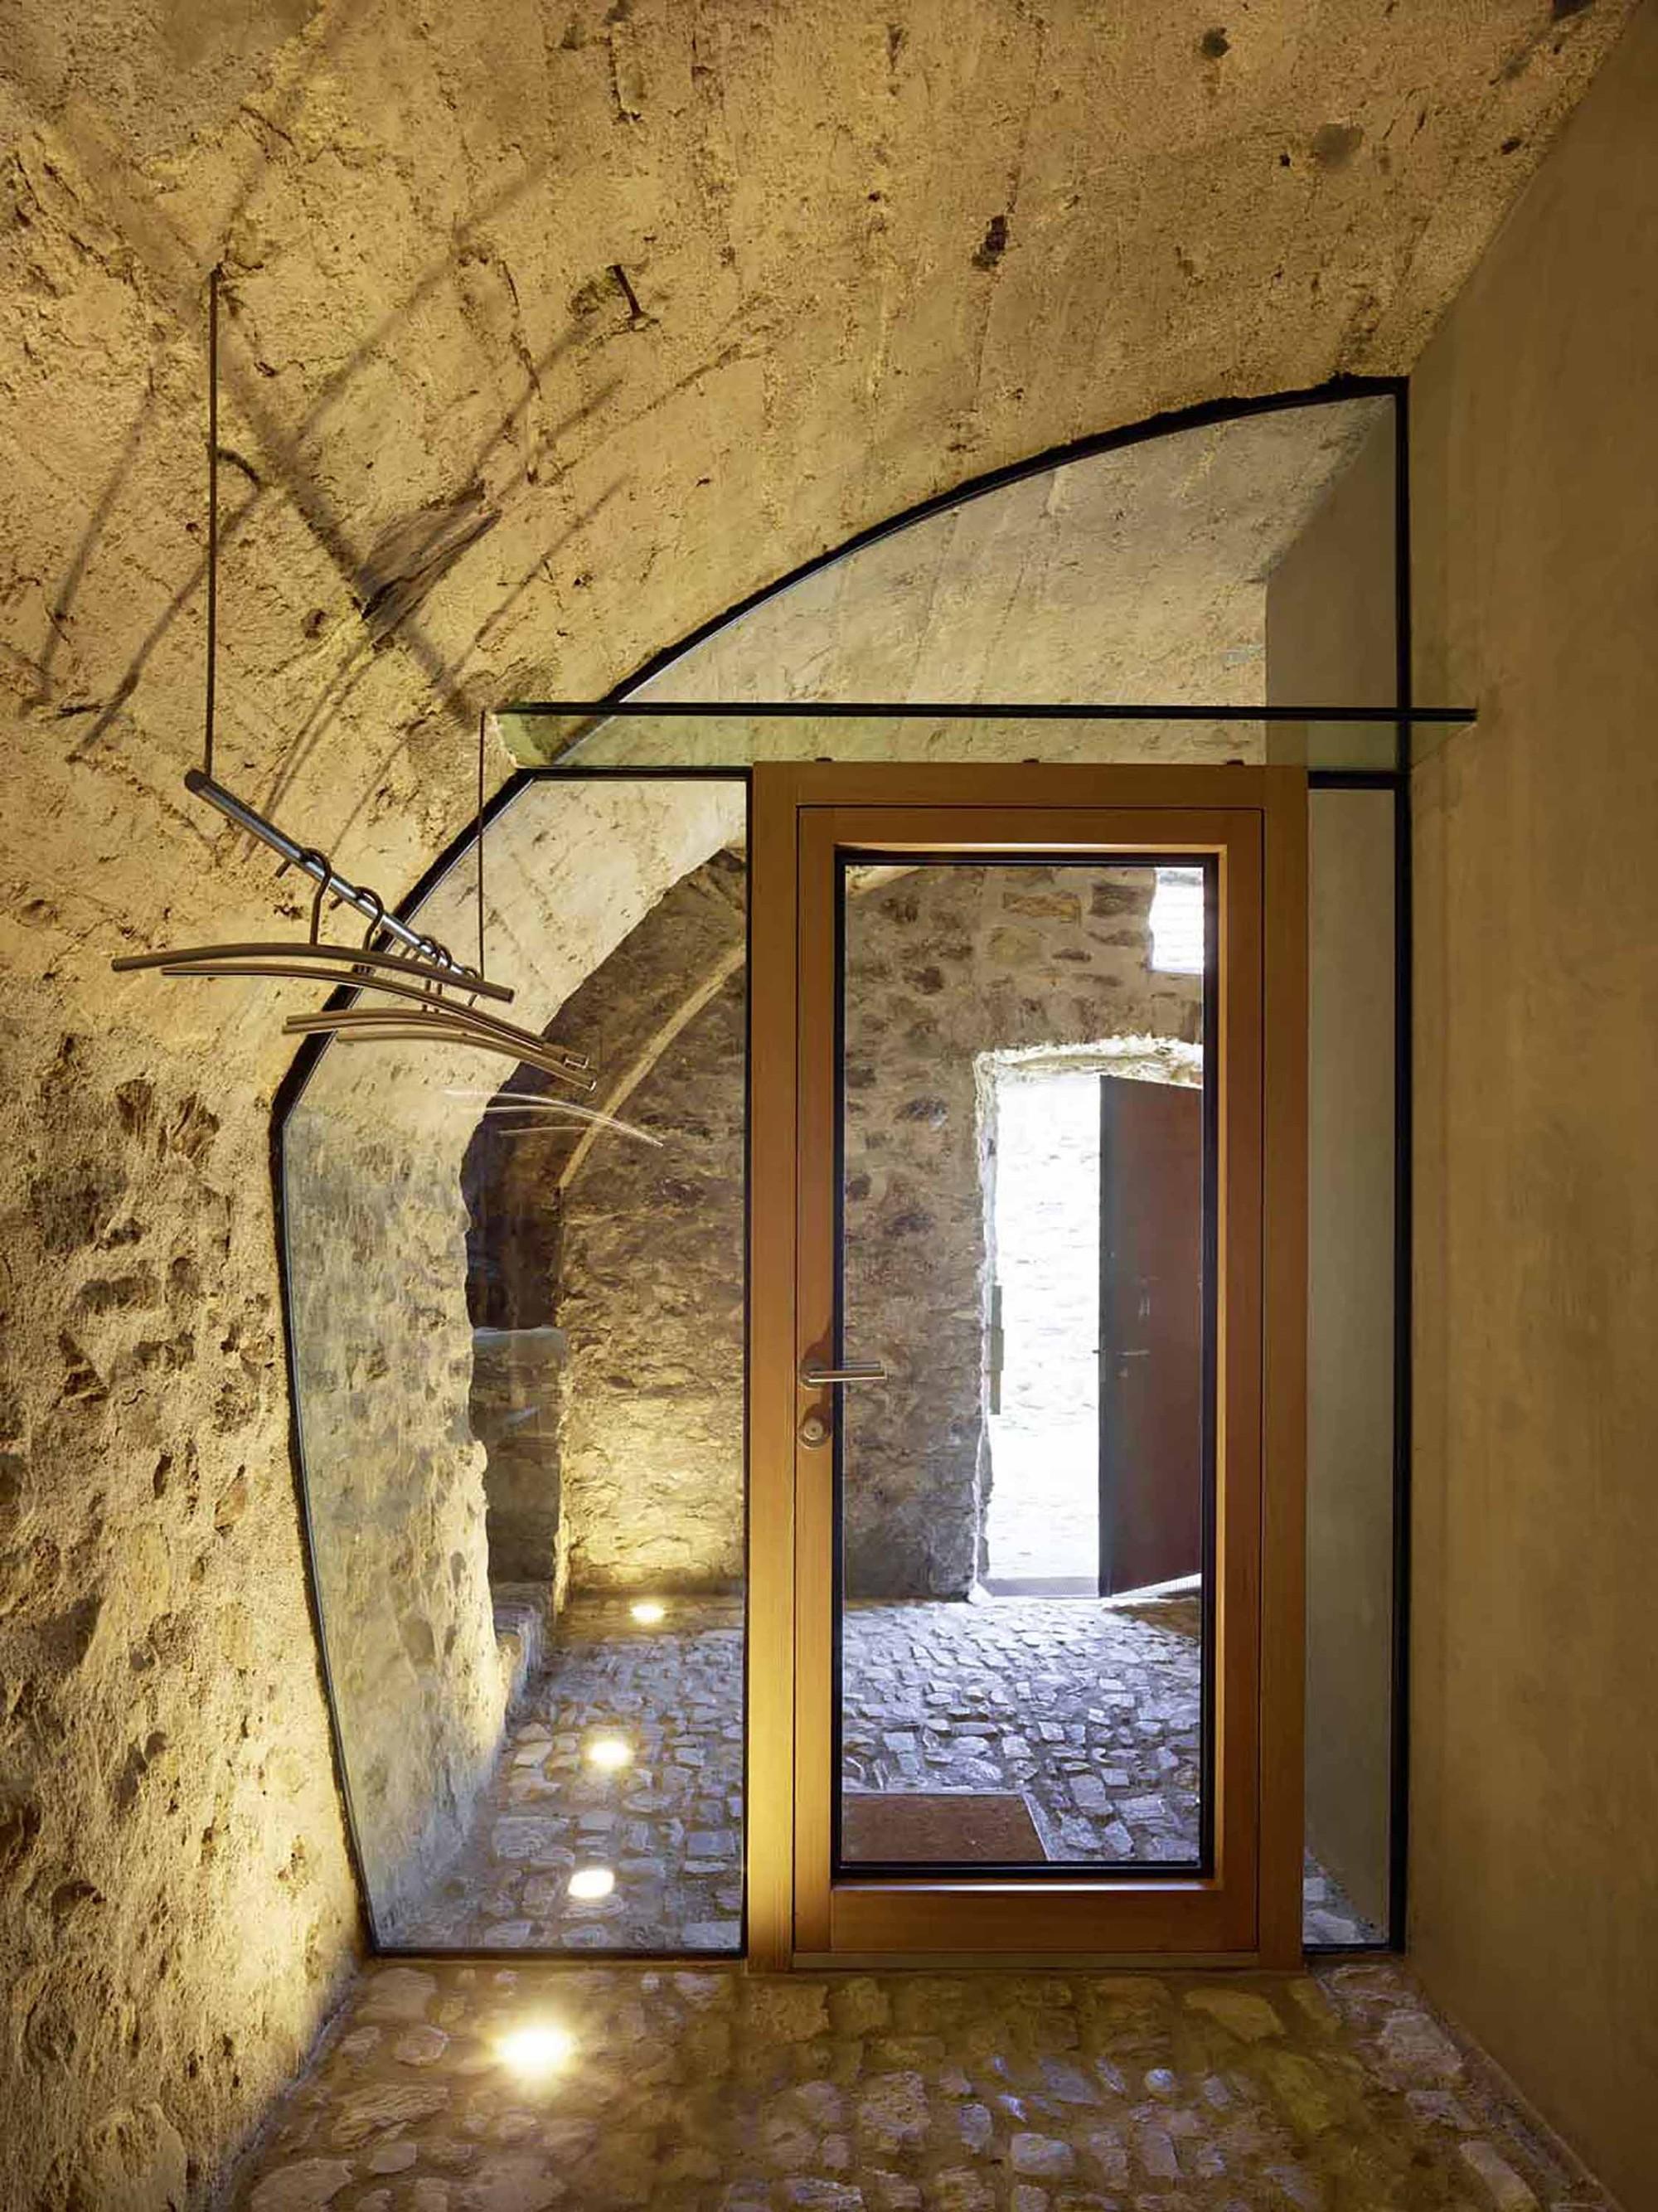 Gallery of stone house transformation in scaiano wespi - Piedra de interior ...